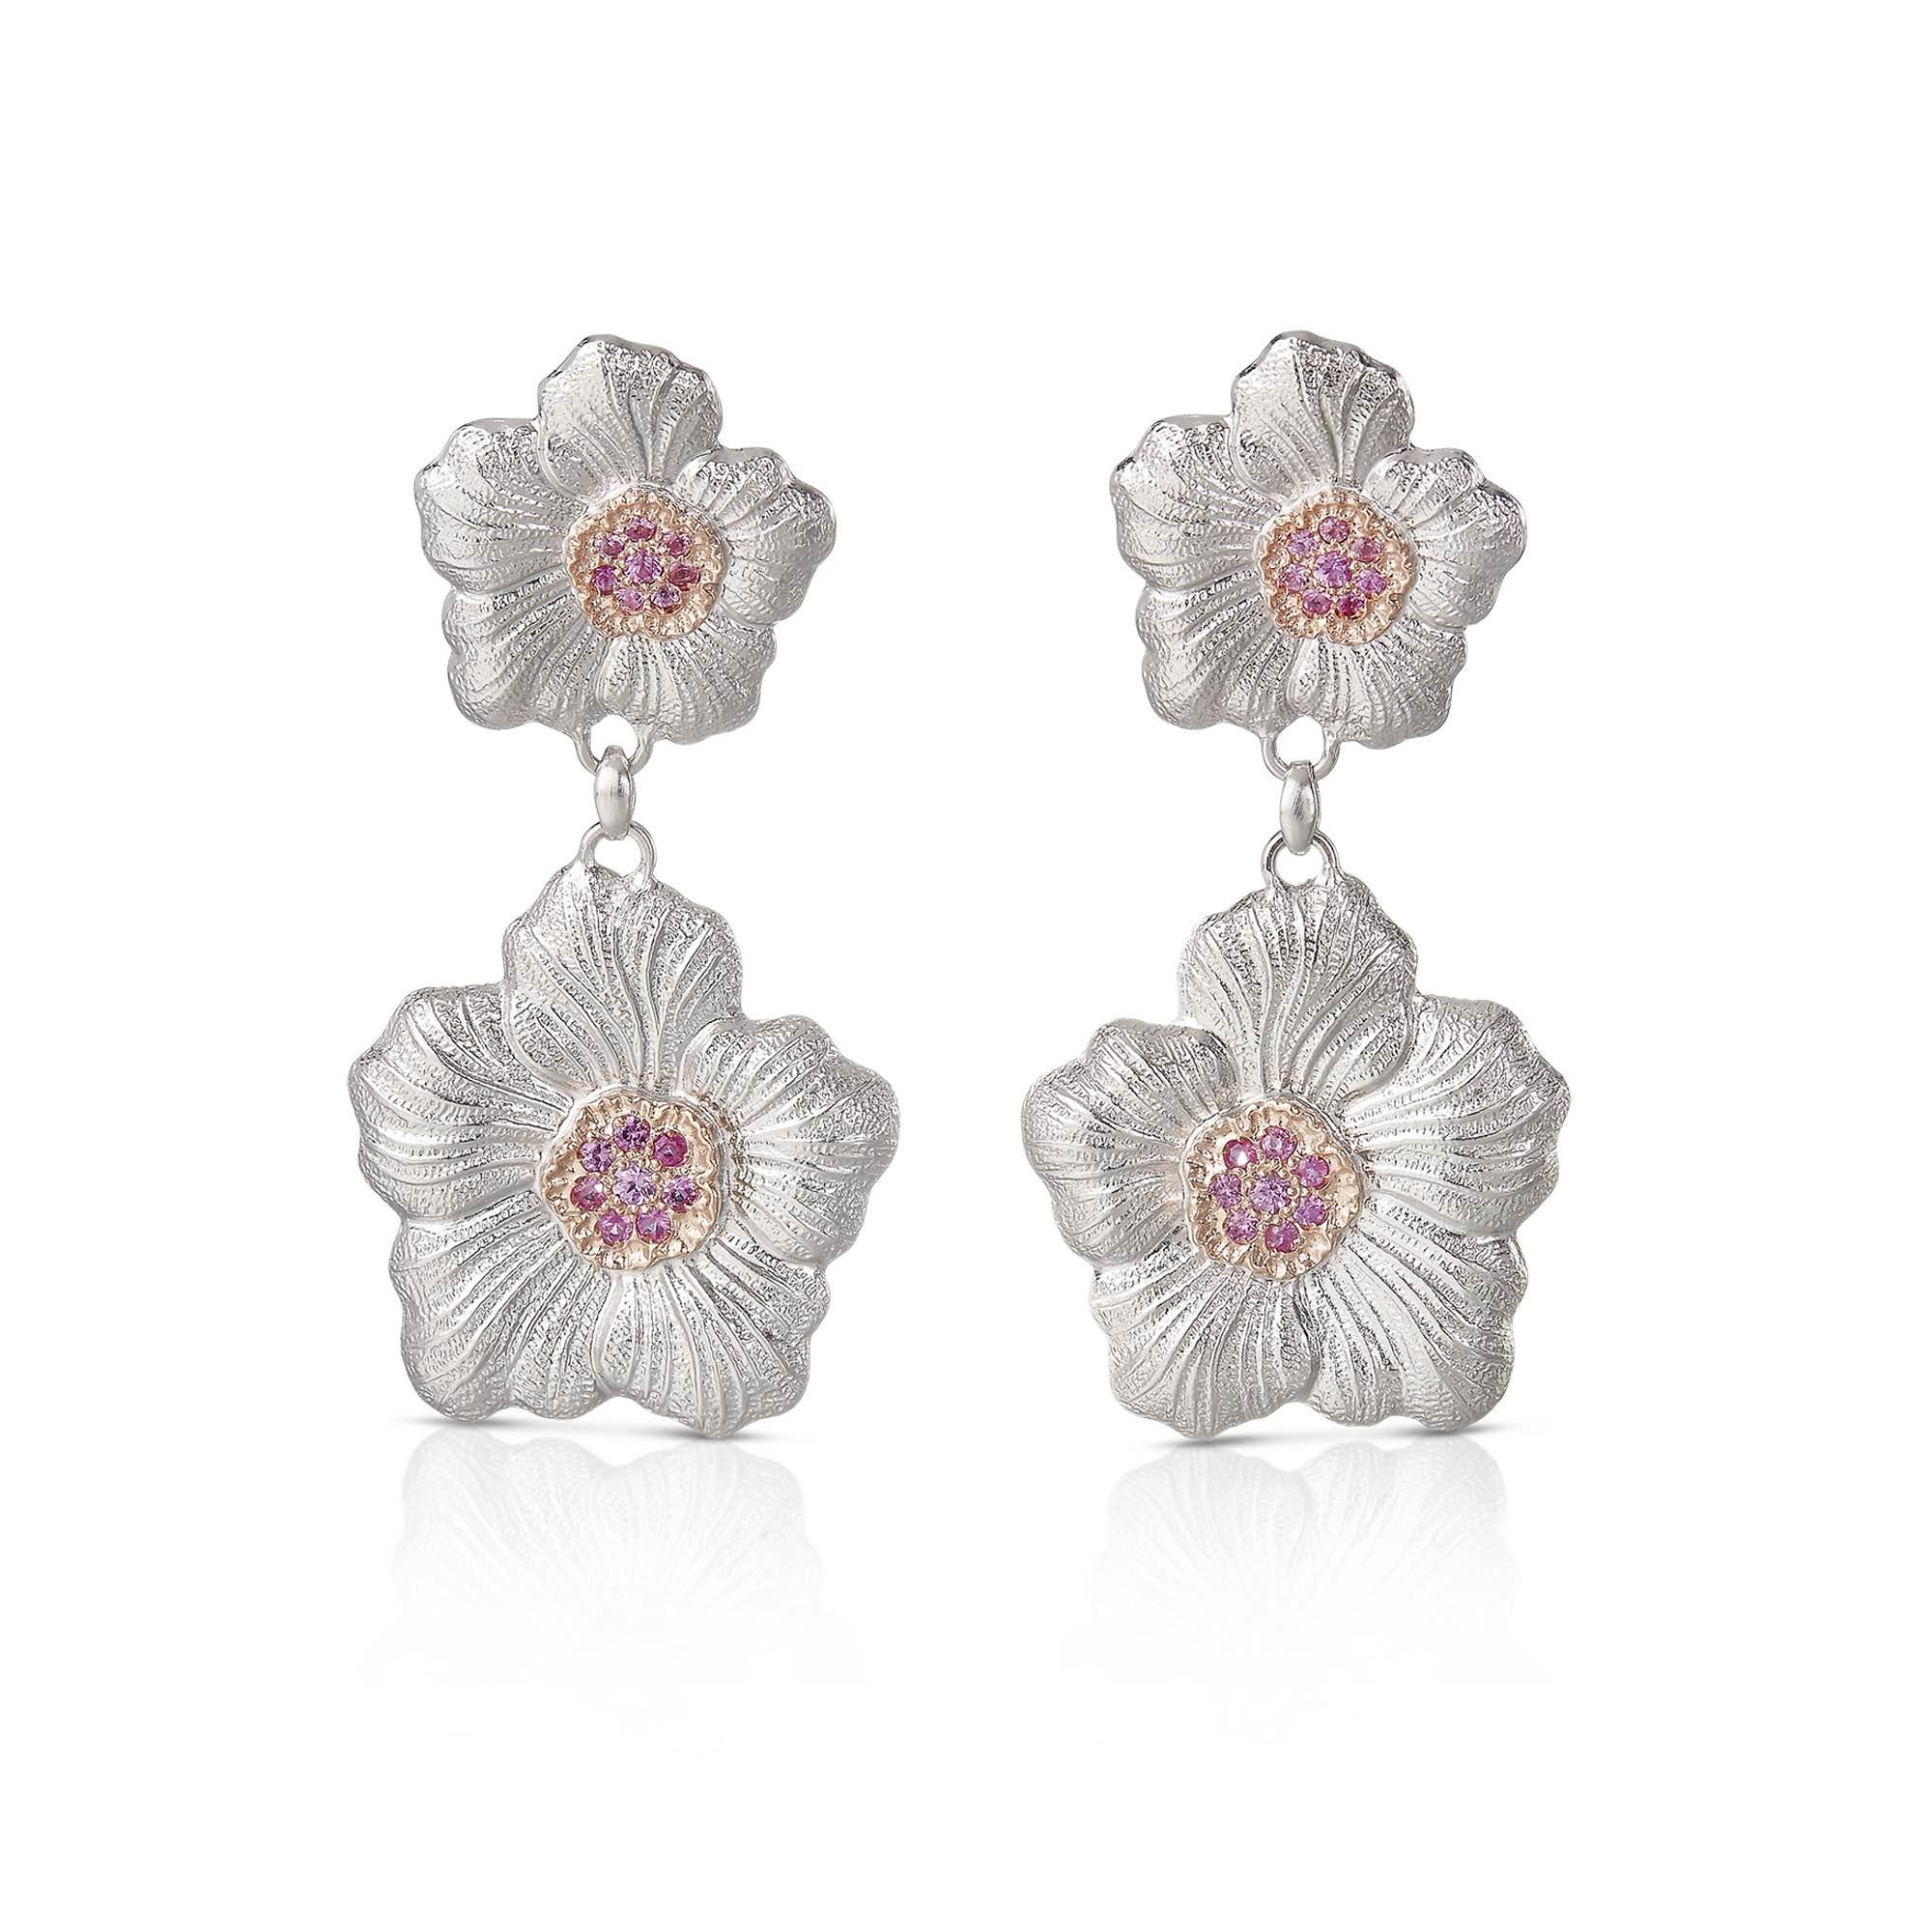 Orecchini Pendenti Gardenia EAR015242 sconto discount earrings